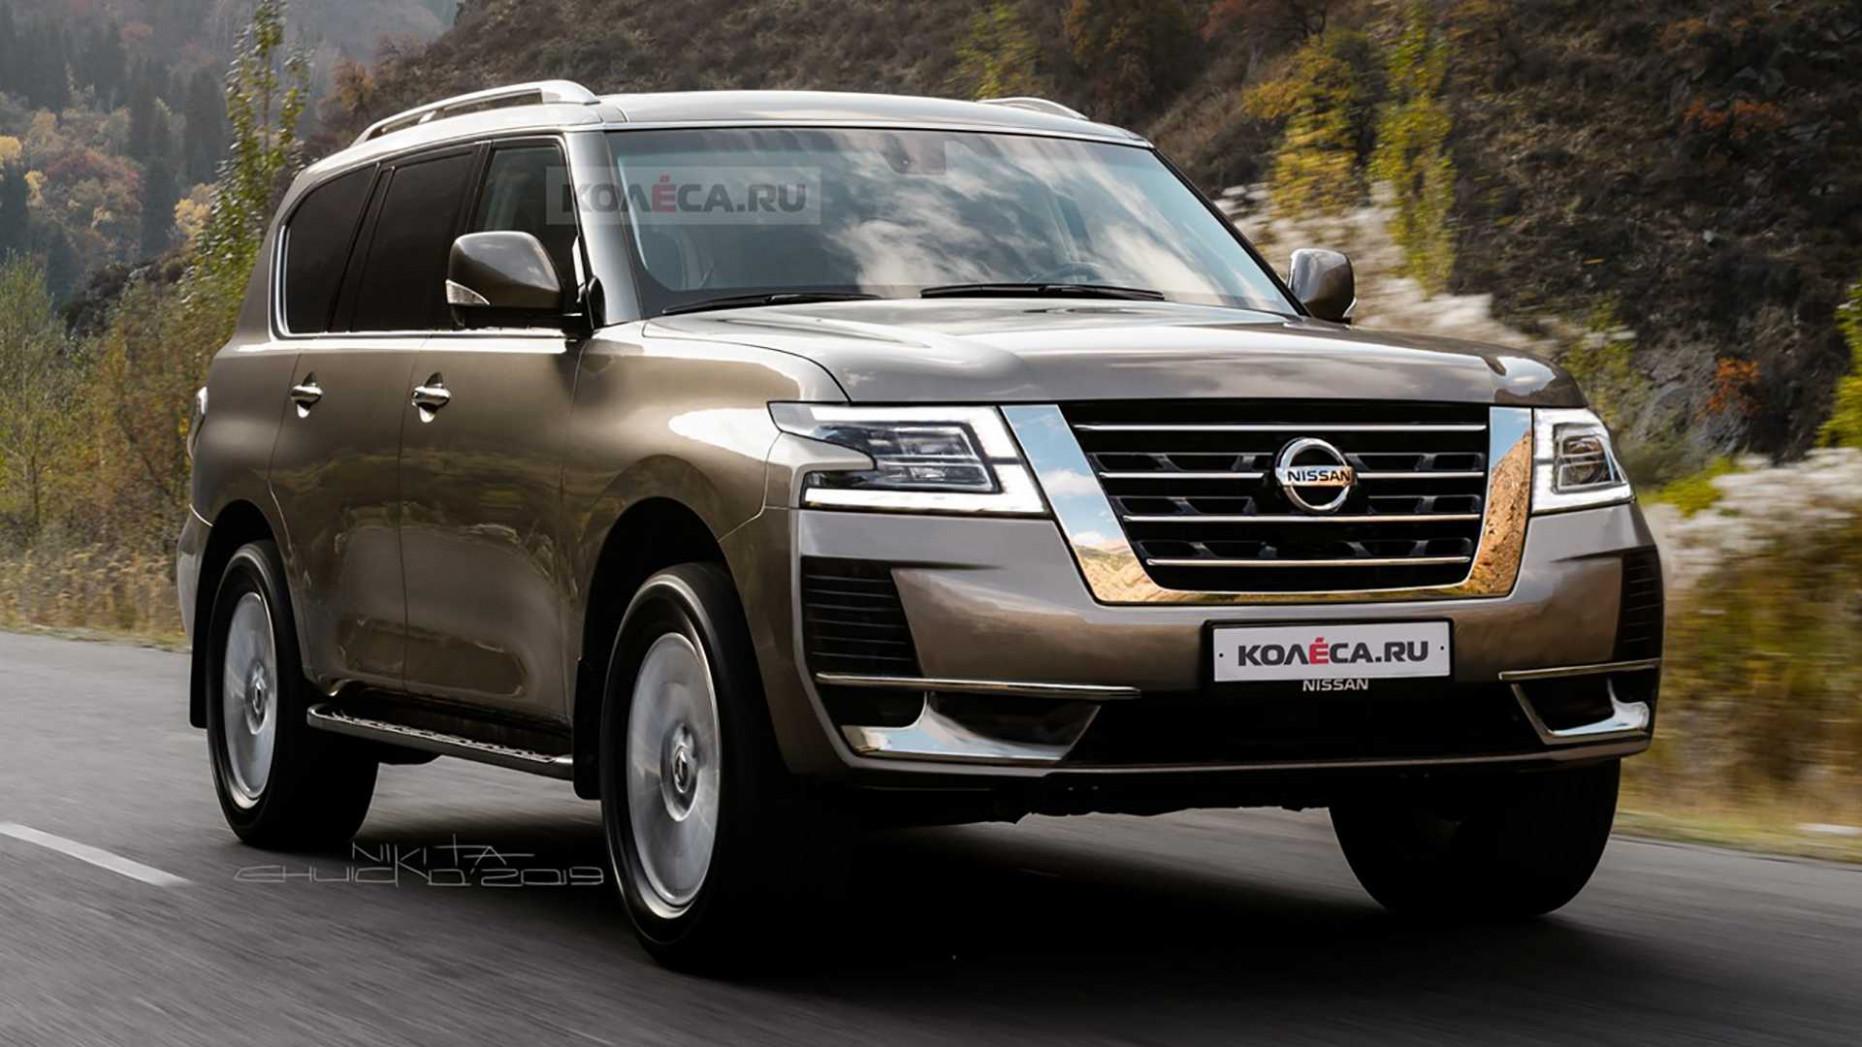 Redesign Nissan Patrol Facelift 2022